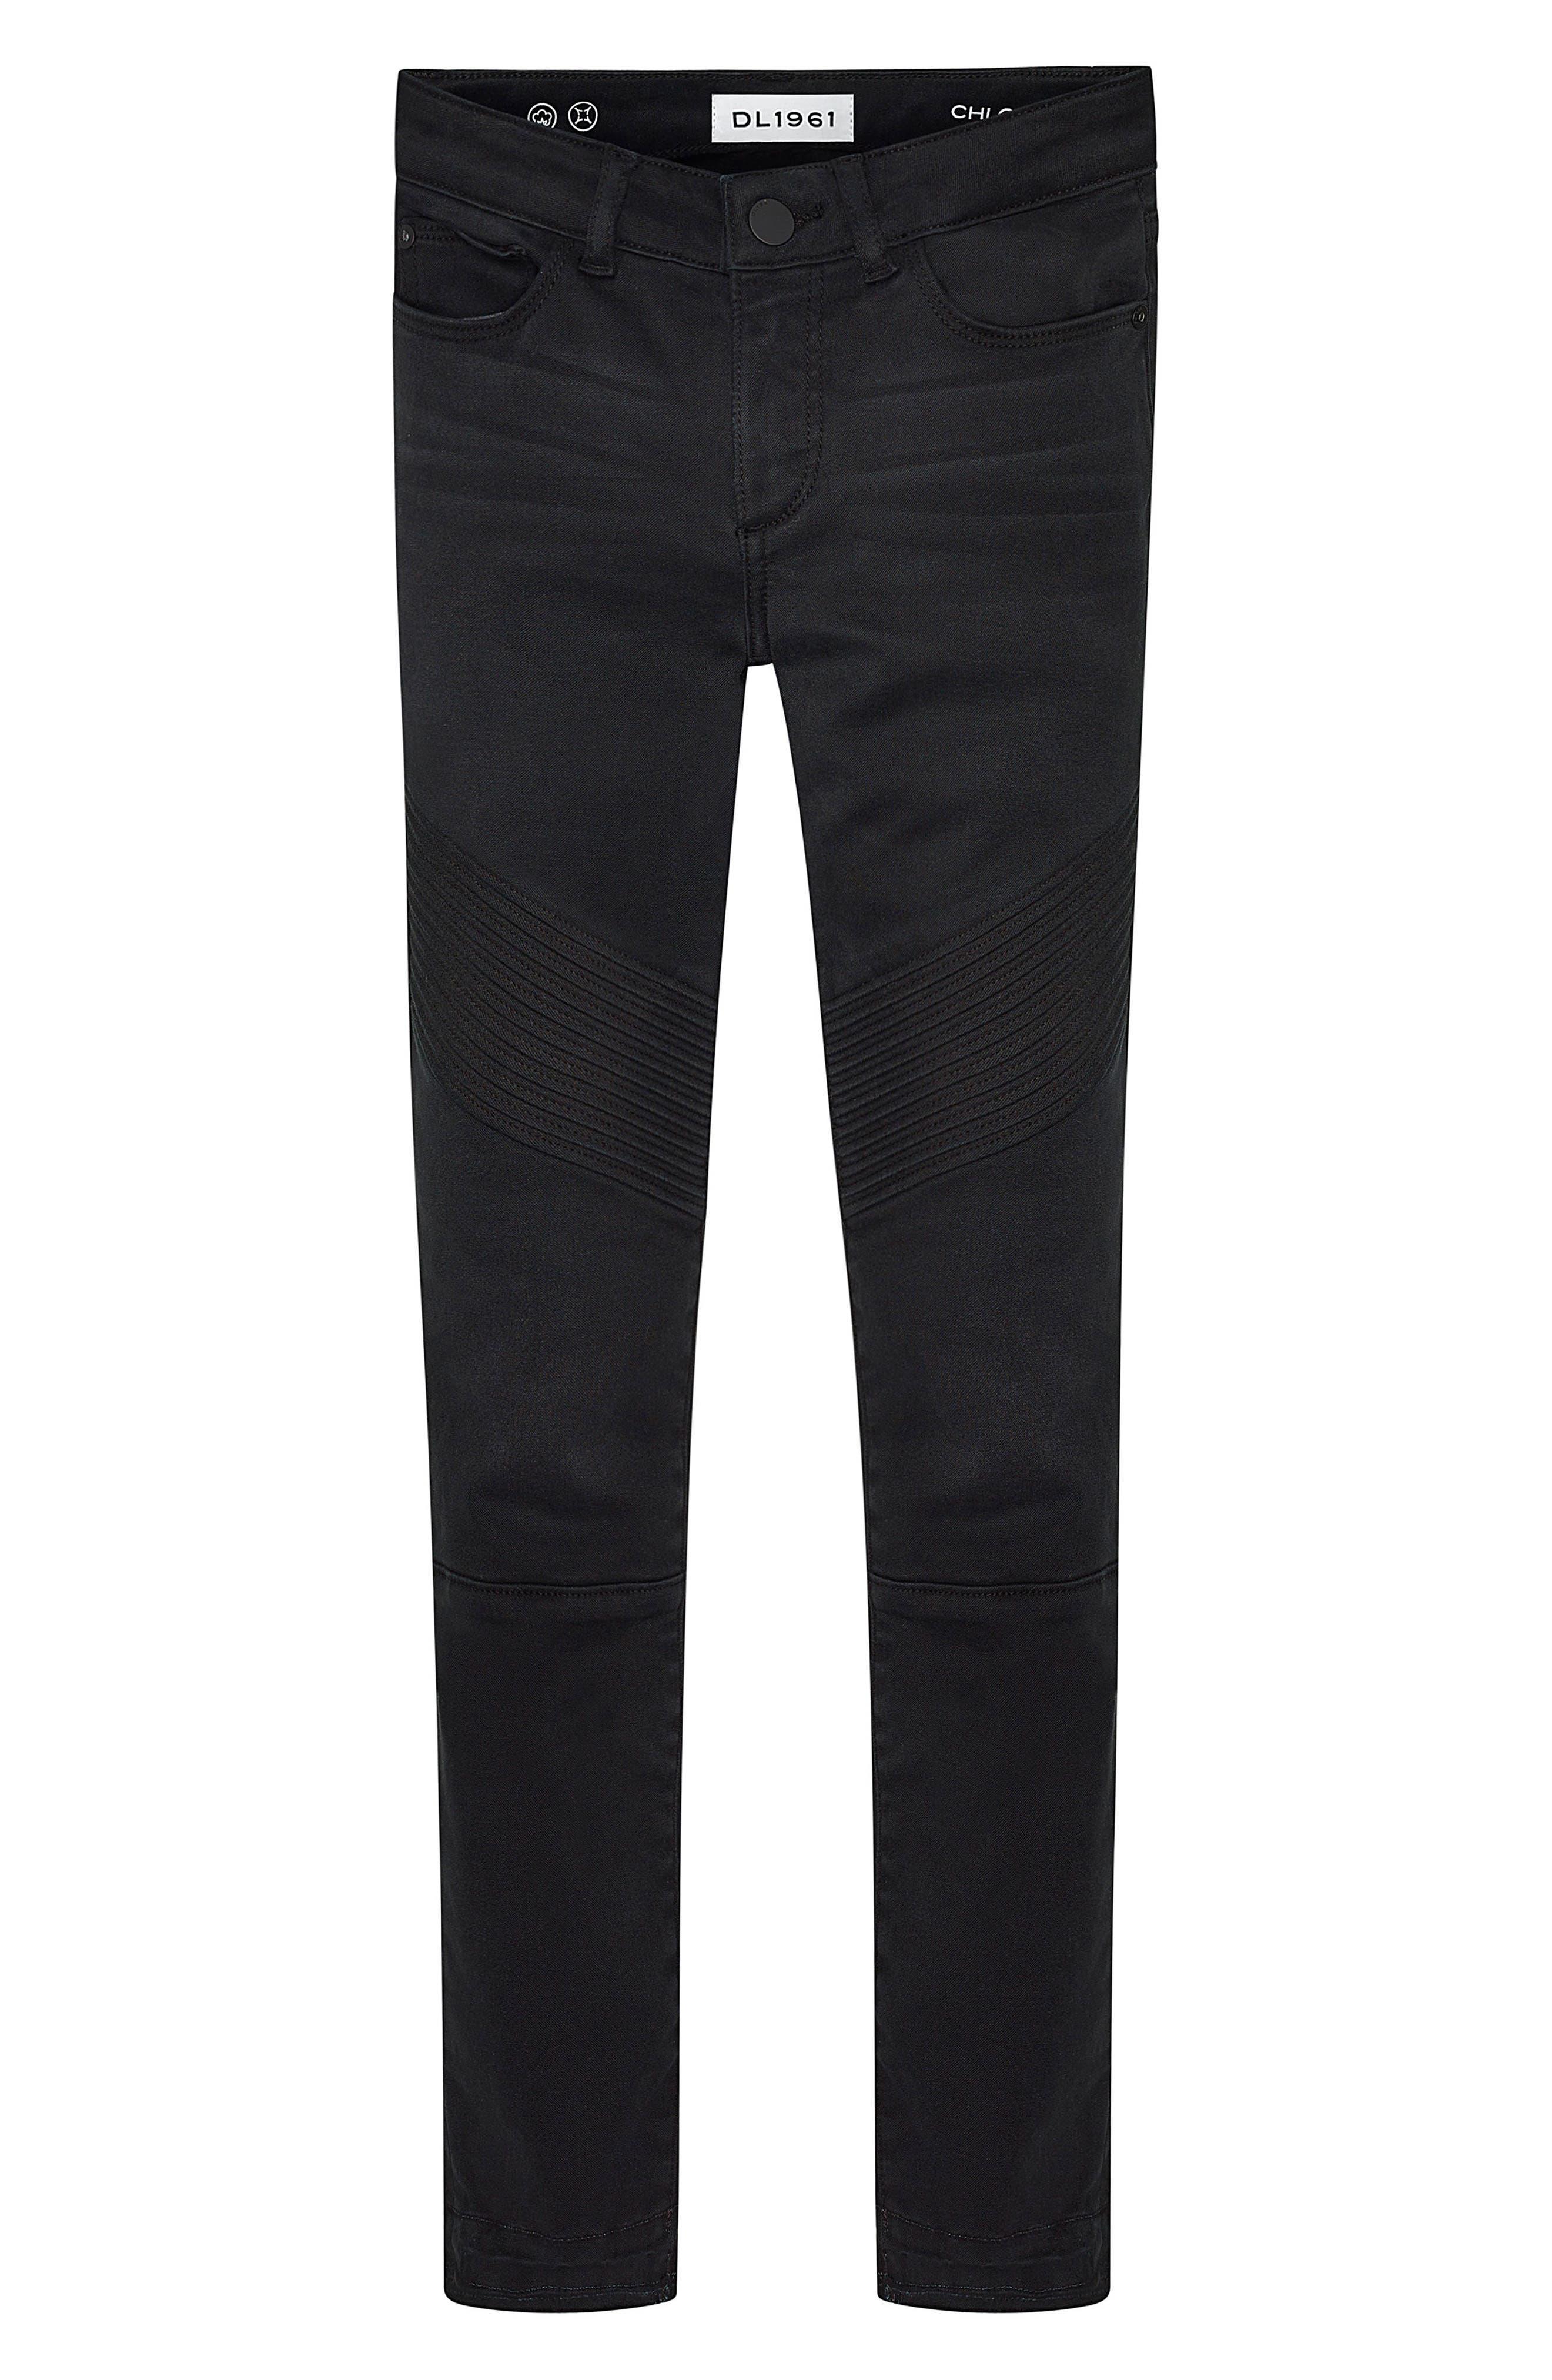 Moto Skinny Jeans,                             Main thumbnail 1, color,                             Washed Black Moto